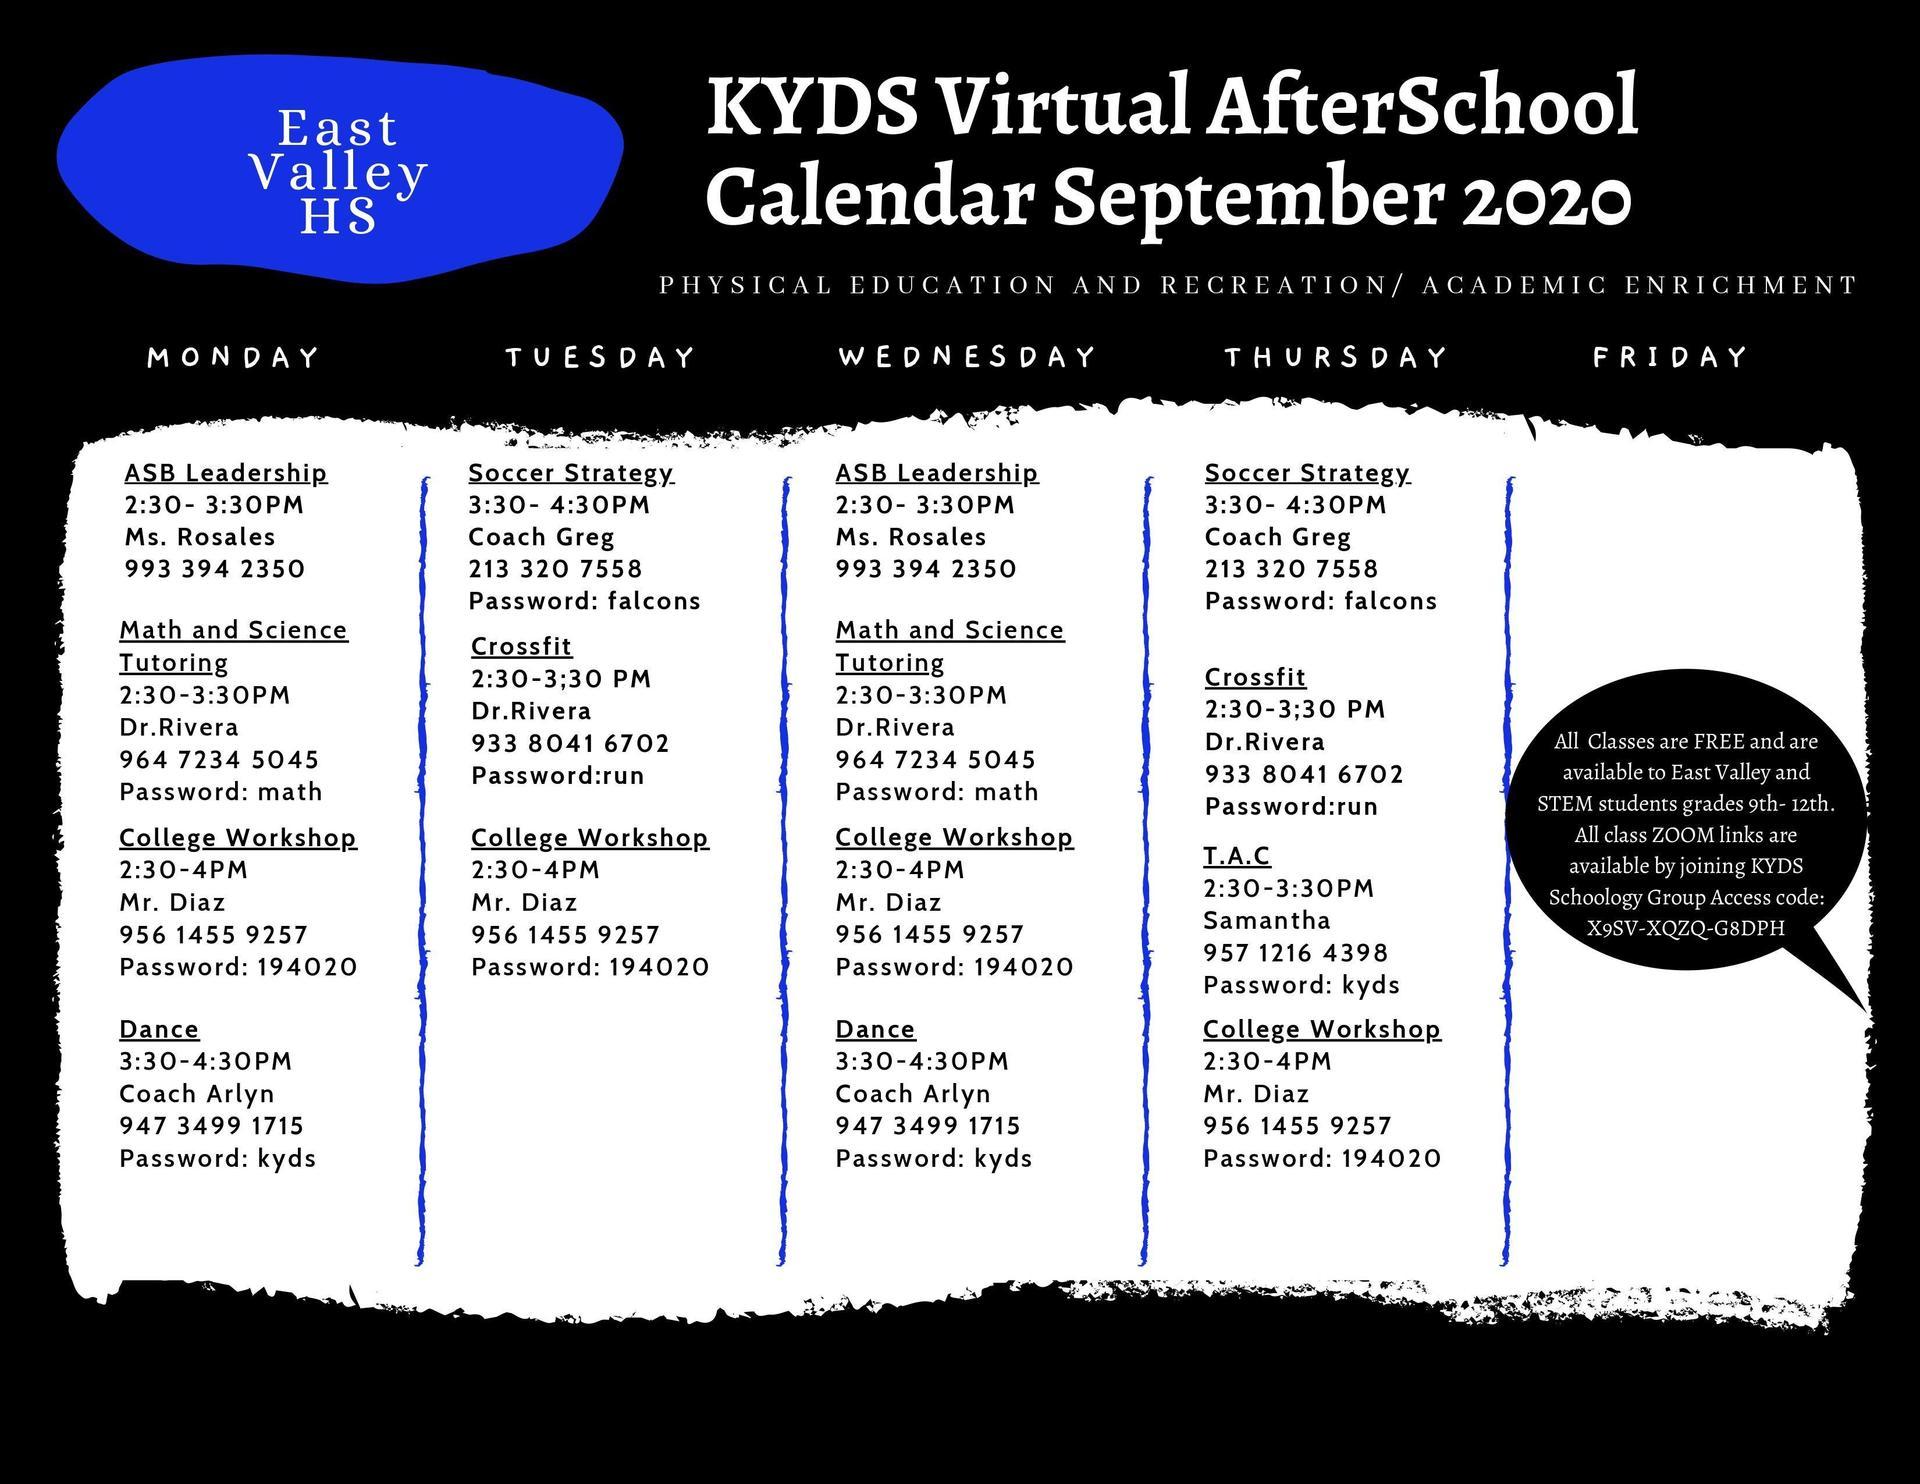 KYDS Calendar